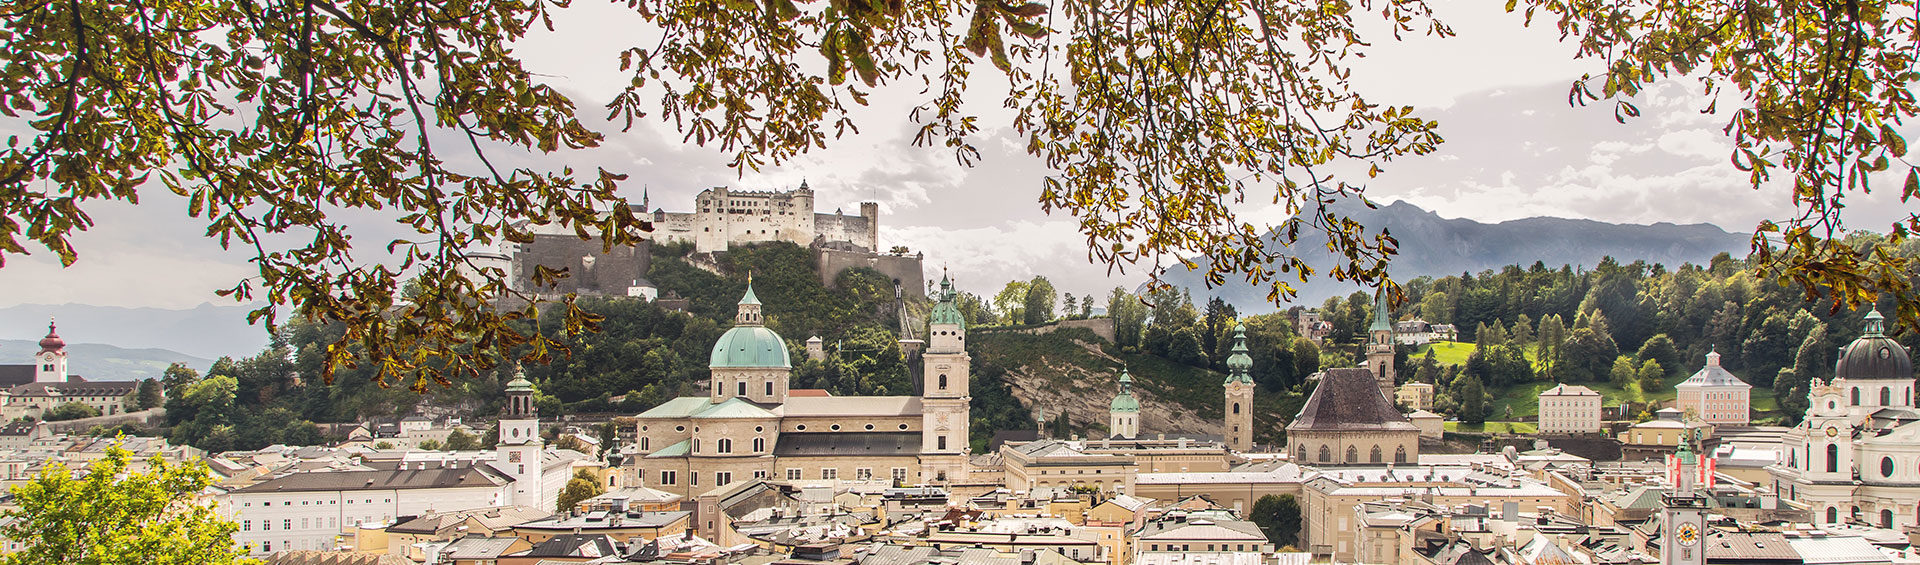 Ausflugsziel im Salzburger Land, Altstadt Salzburg